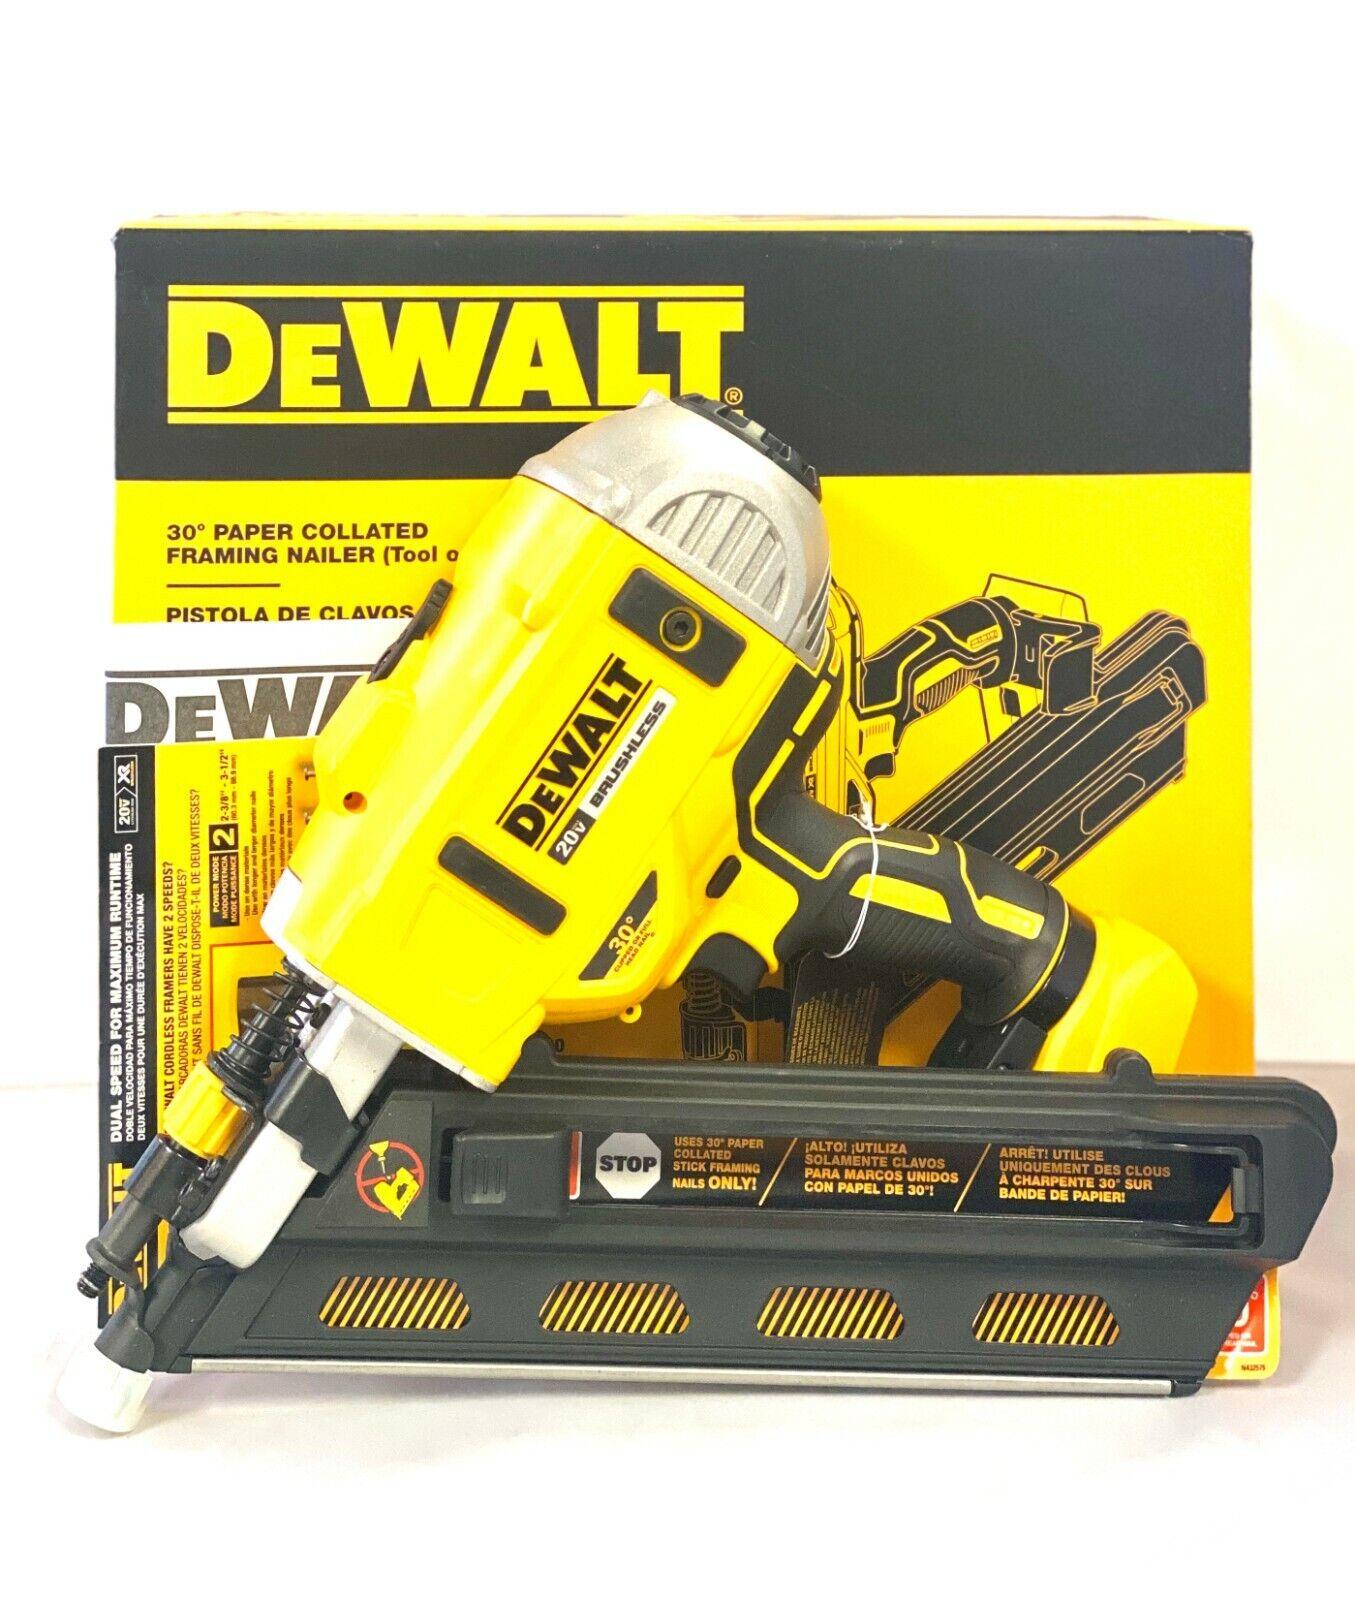 "DEWALT DCN692B 20V 2-3.5"" Cordless 30° Framing Nailer"